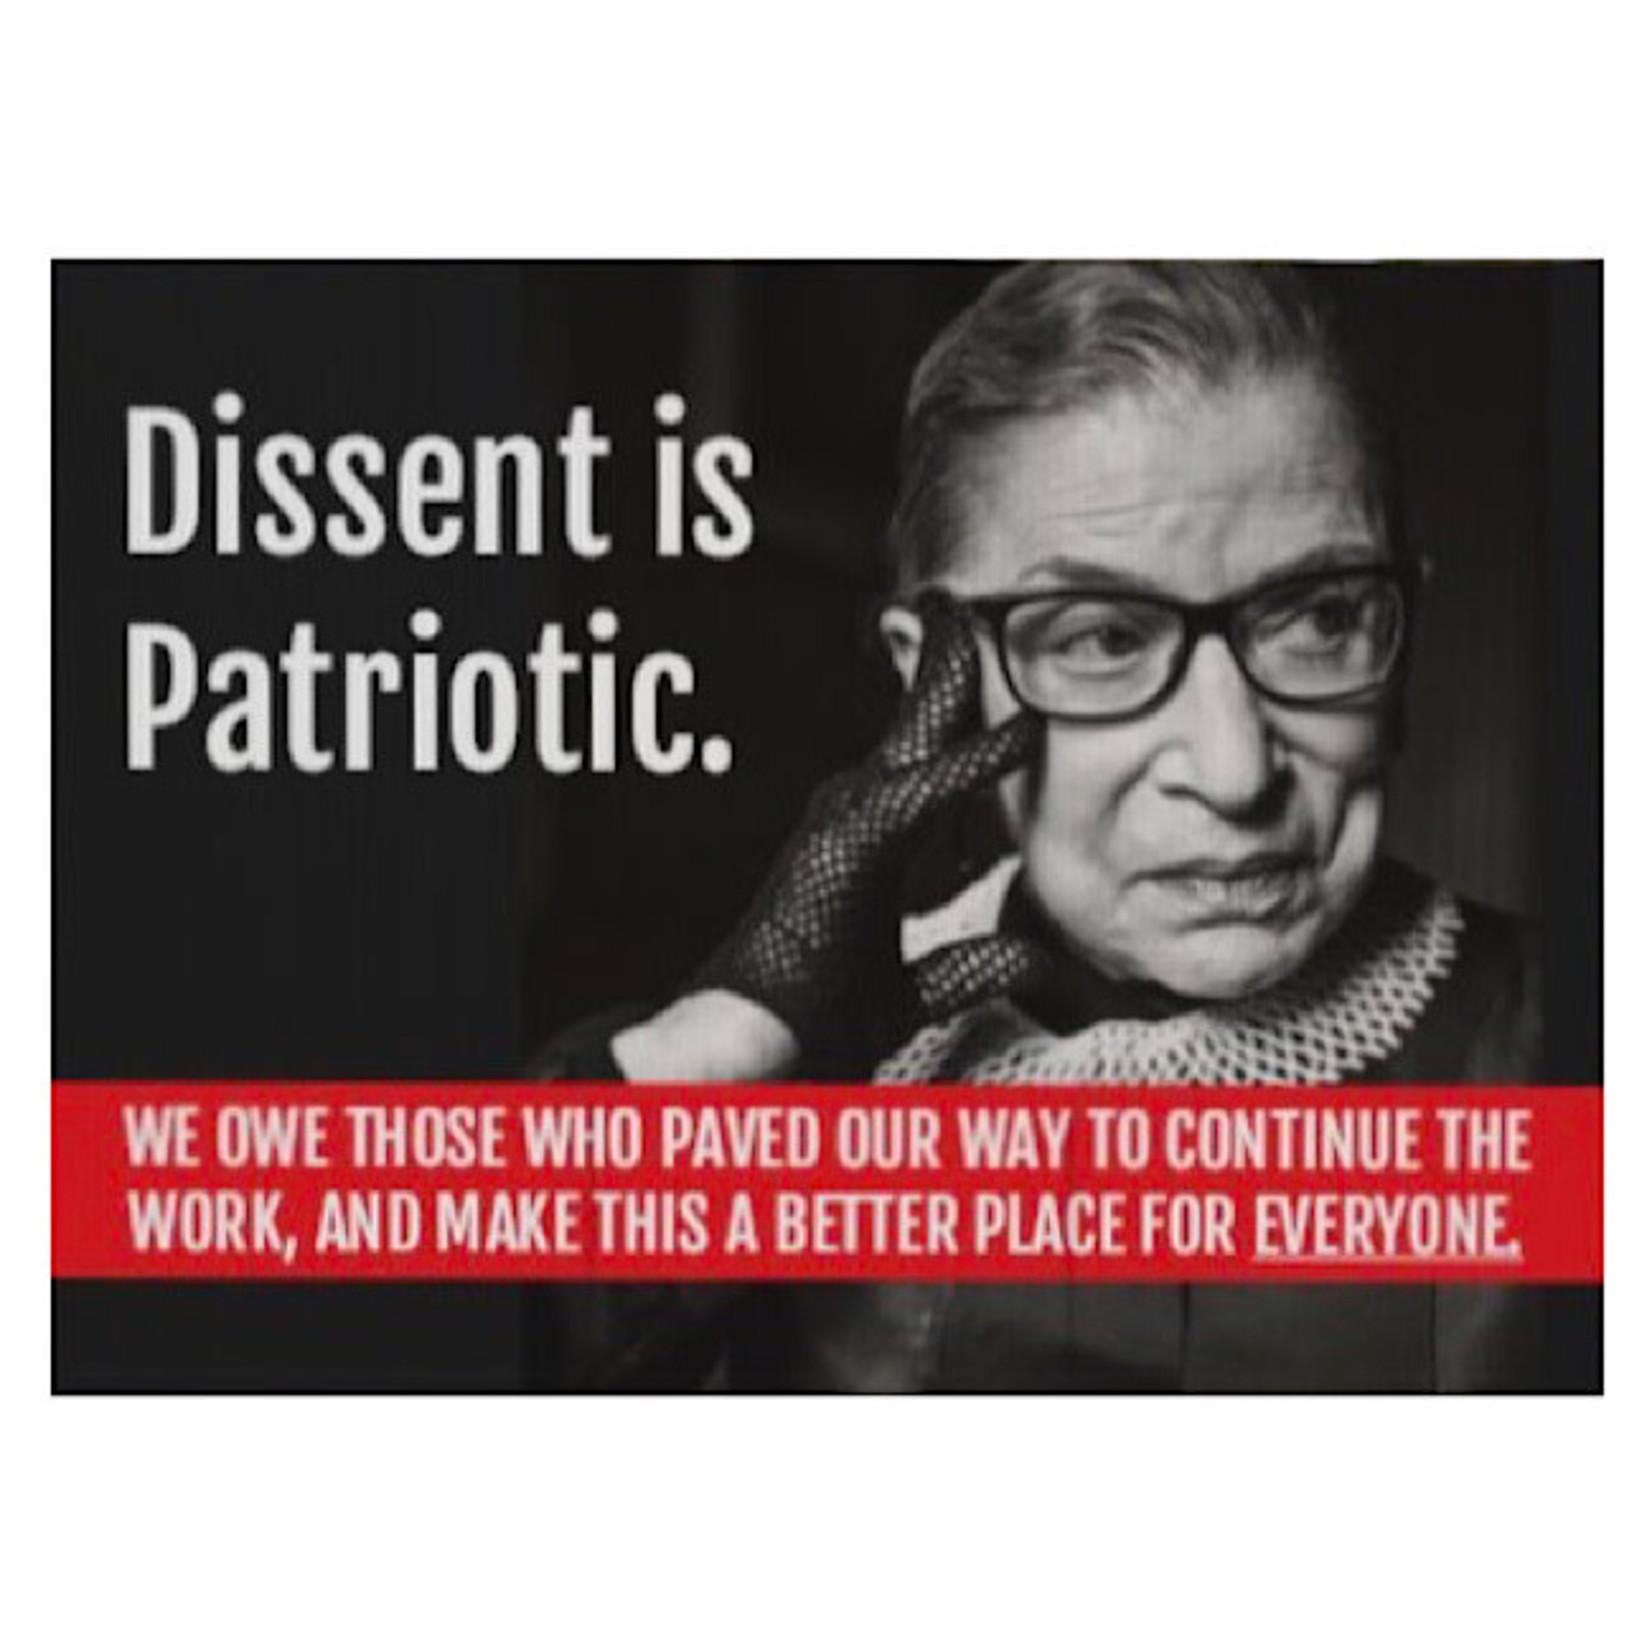 Bad Annie's Sign (Yard) - Dissent Is Patriotic - Ruth Bader Ginsberg